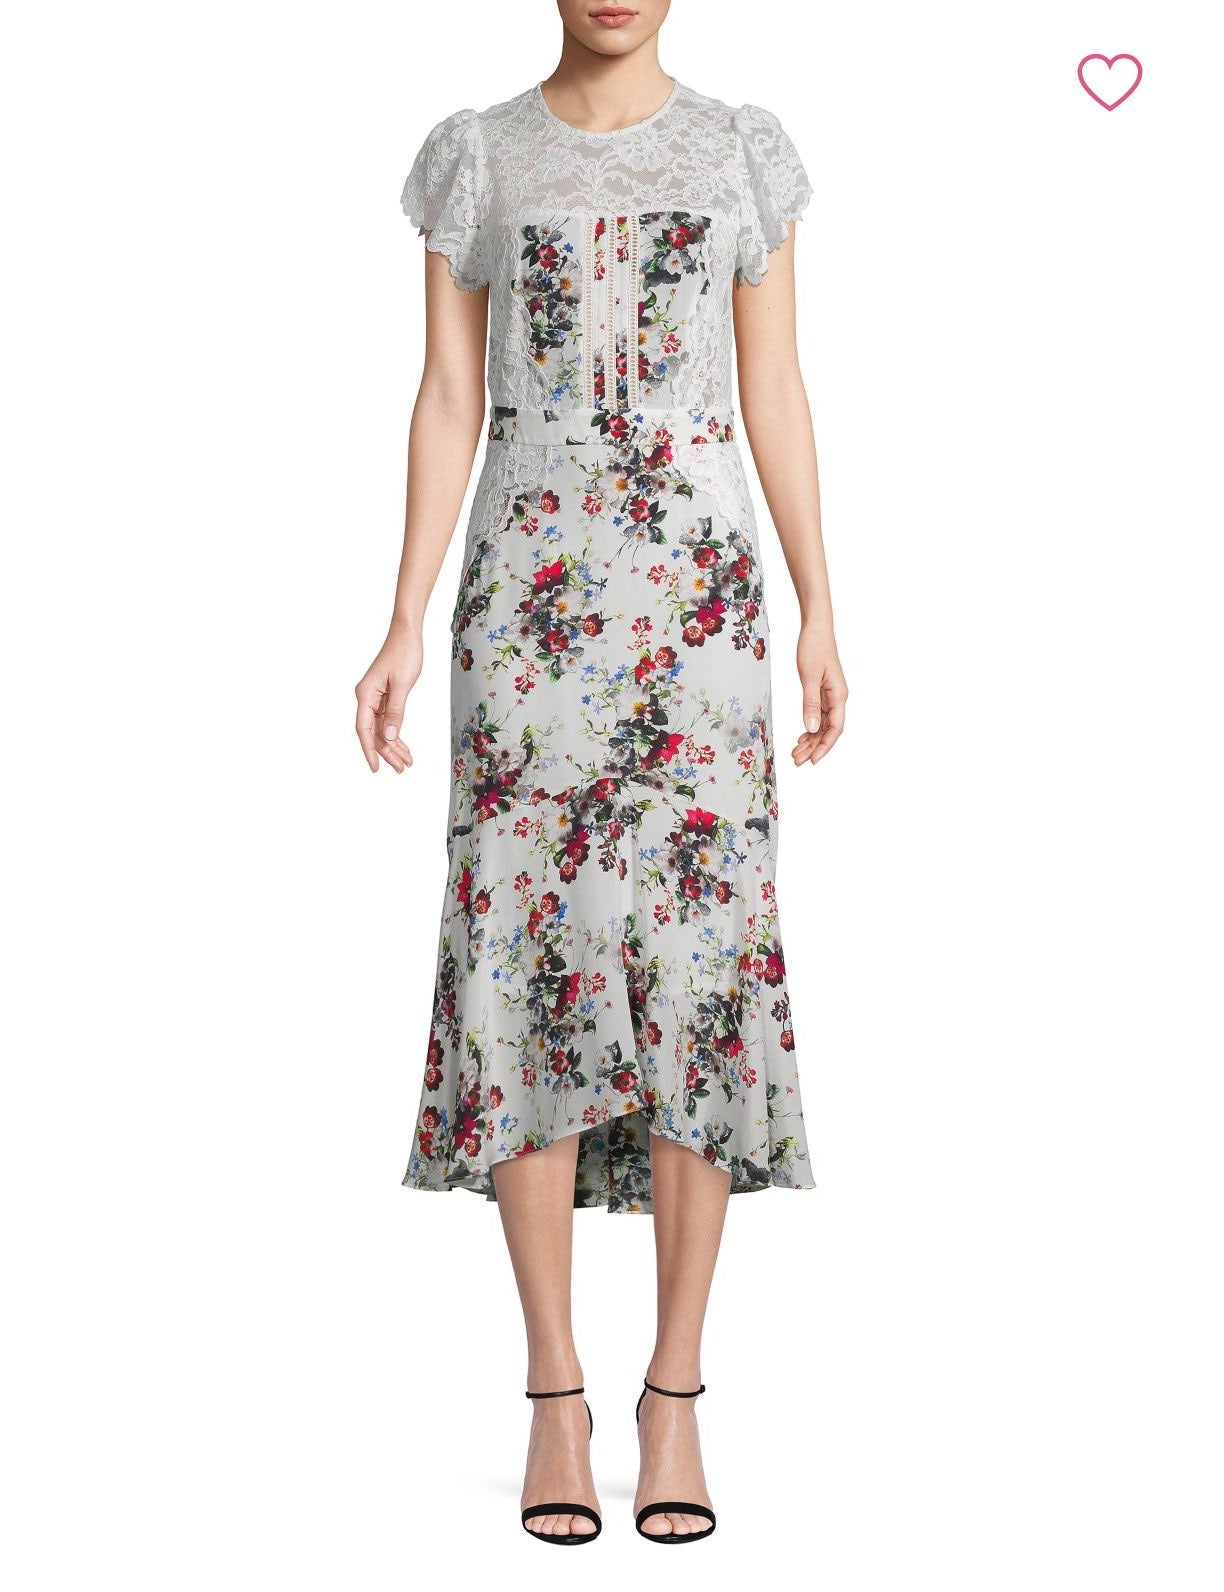 Marissa Webb | Imani print & lace dress